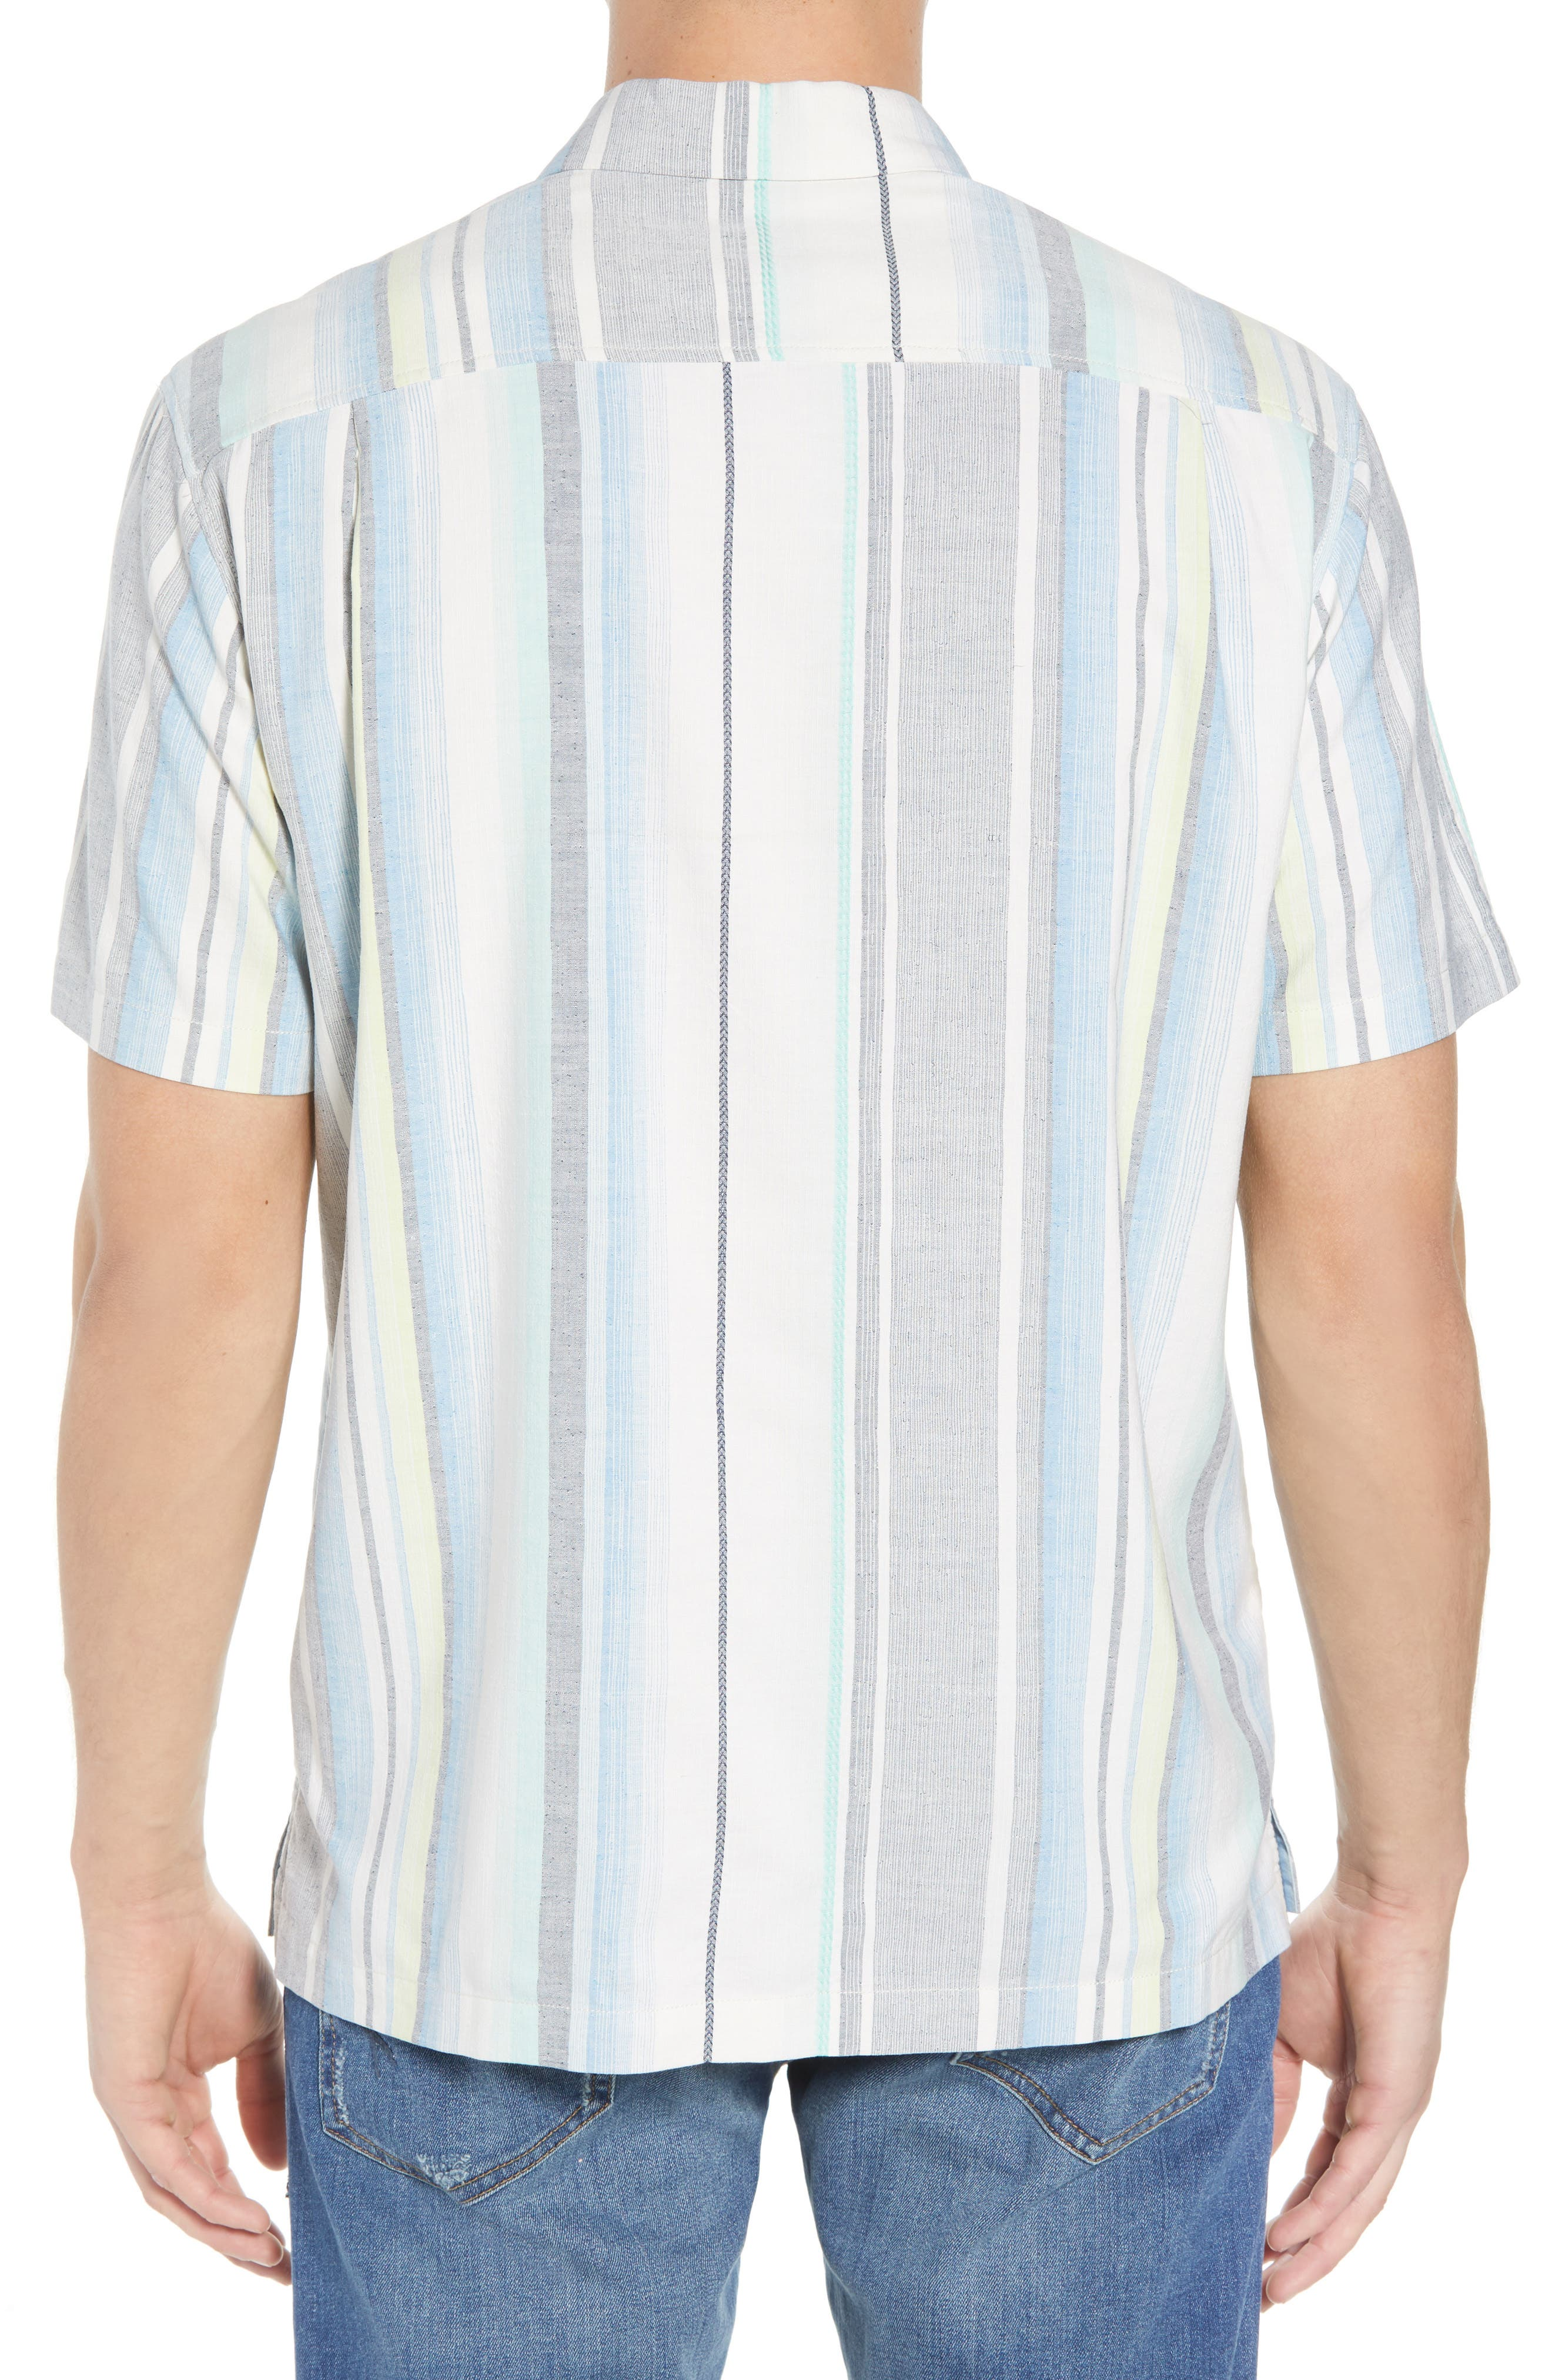 Posado Sands Silk Camp Shirt,                             Alternate thumbnail 3, color,                             Blue Aster